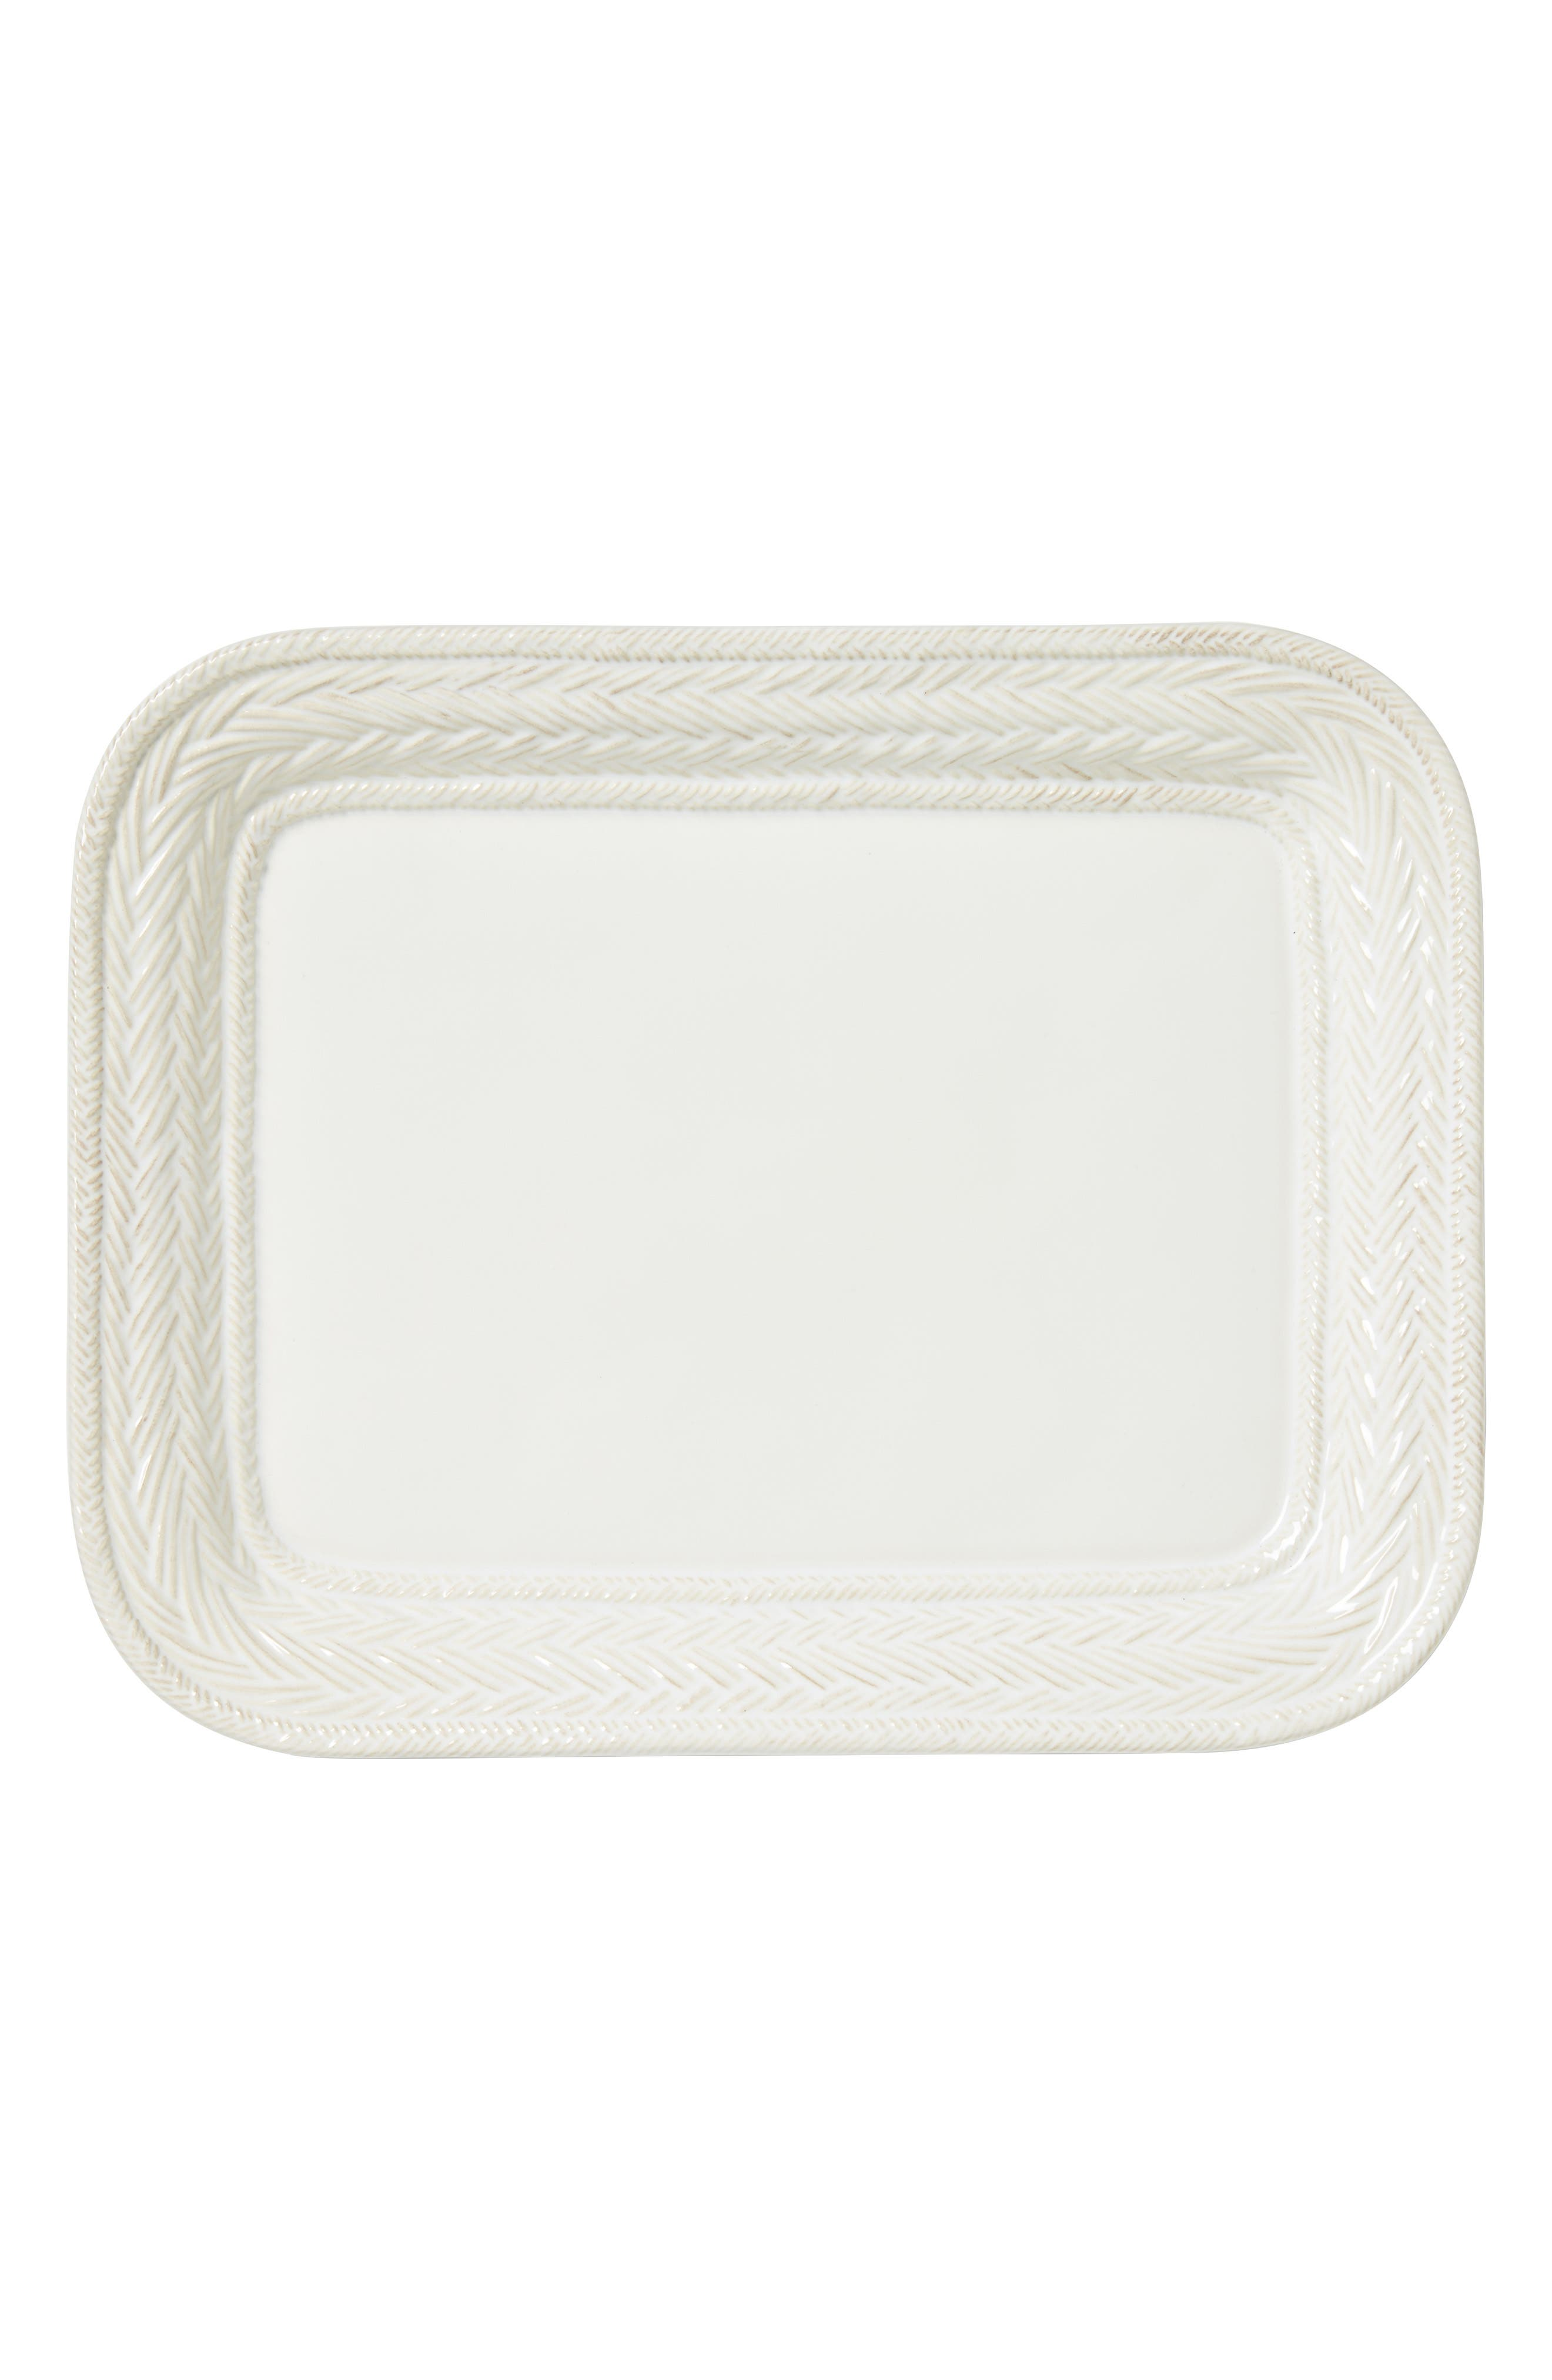 Le Panier Large Ceramic Platter,                             Alternate thumbnail 2, color,                             WHITE